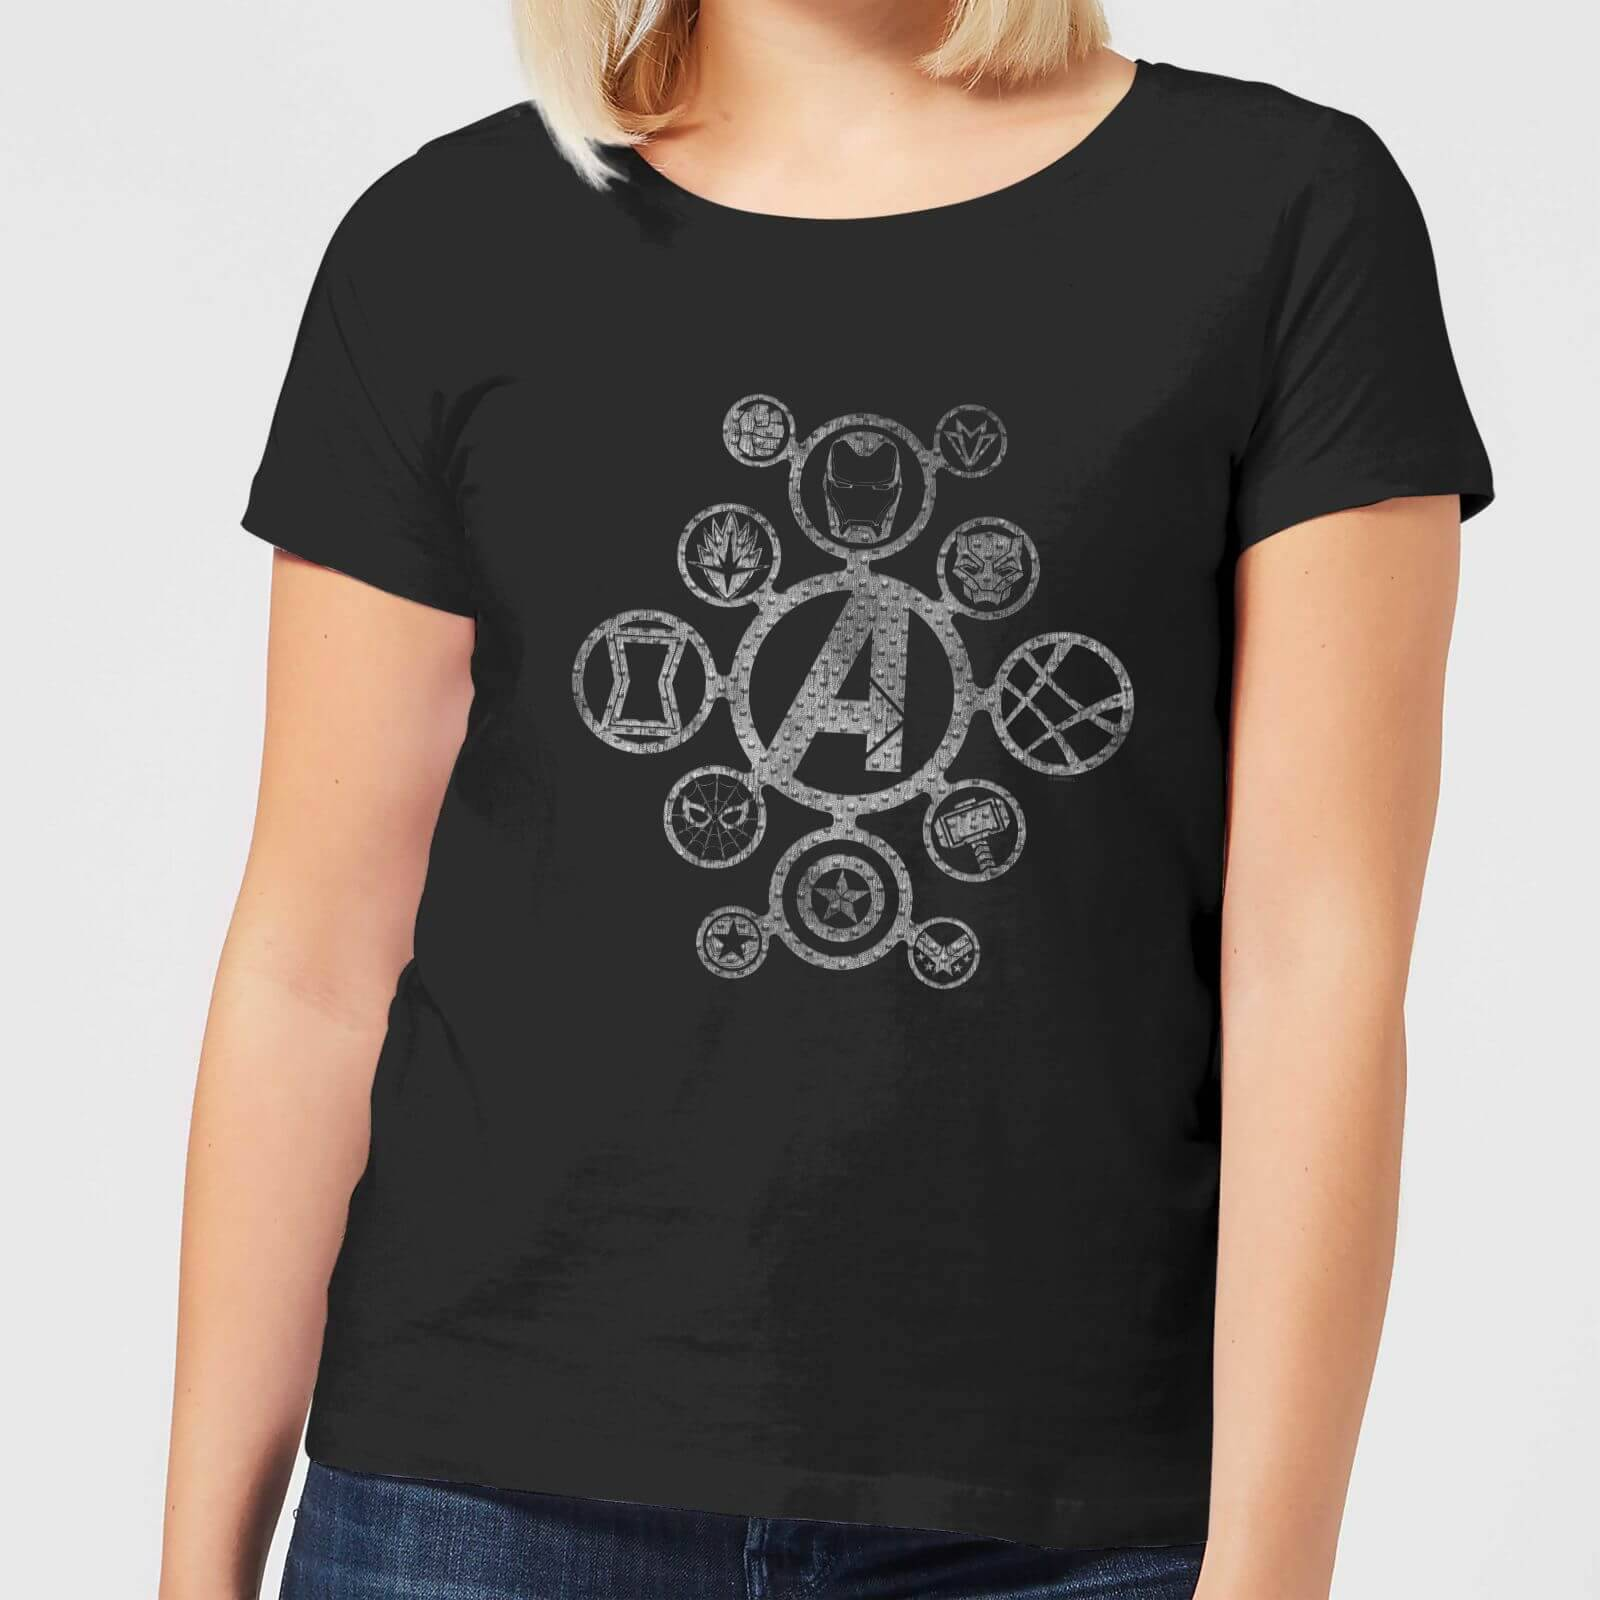 Marvel Avengers Distressed Metal Icon Women's T-Shirt - Black - S - Black